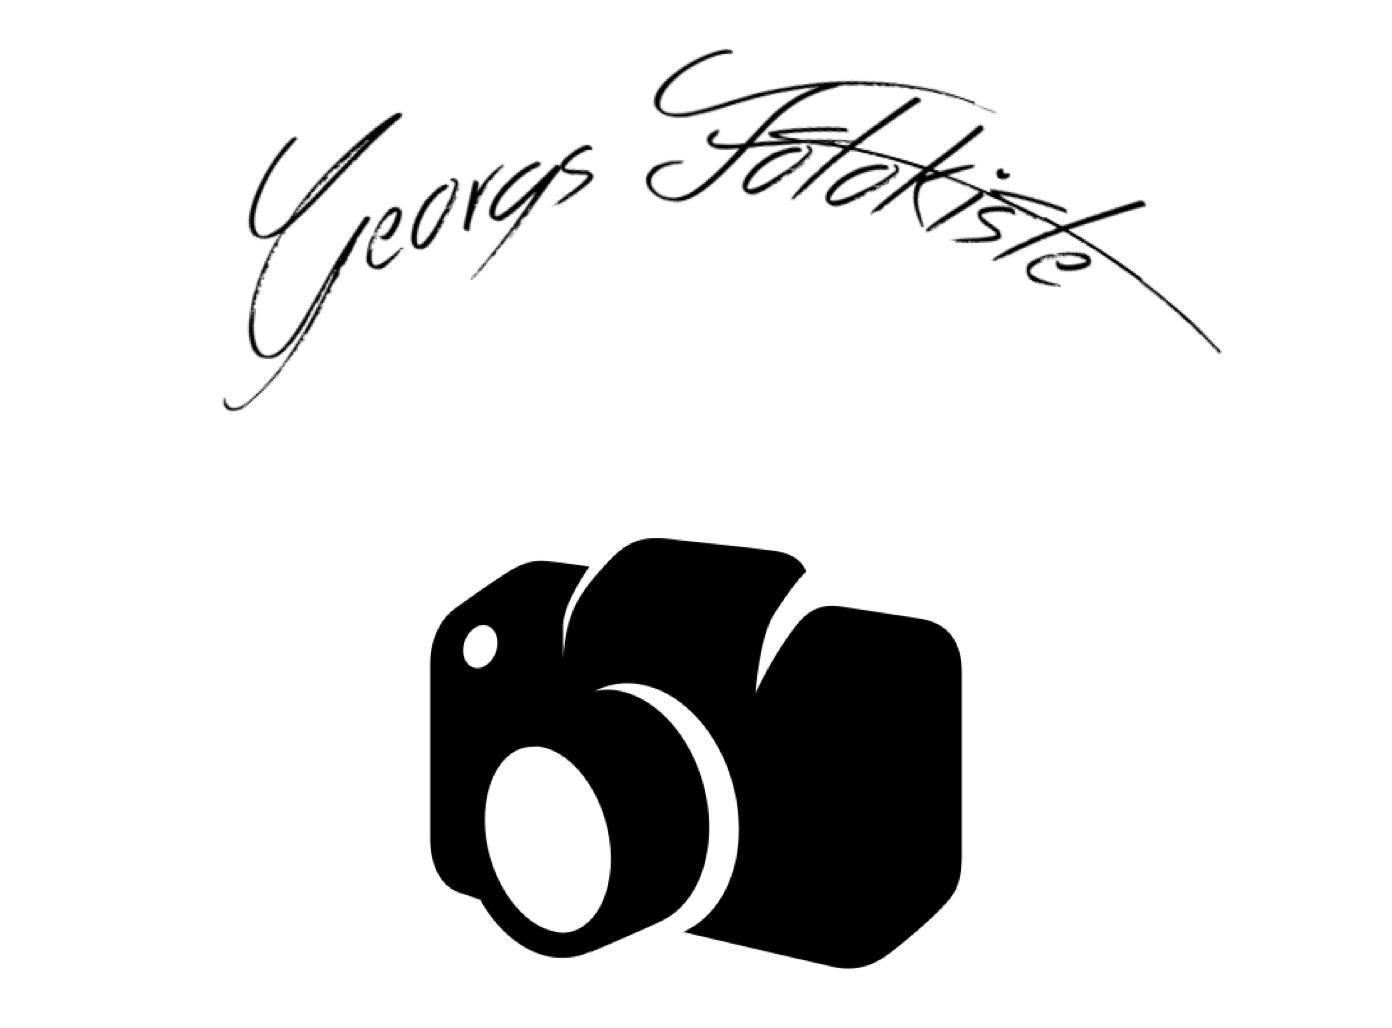 Georgs Fotokiste